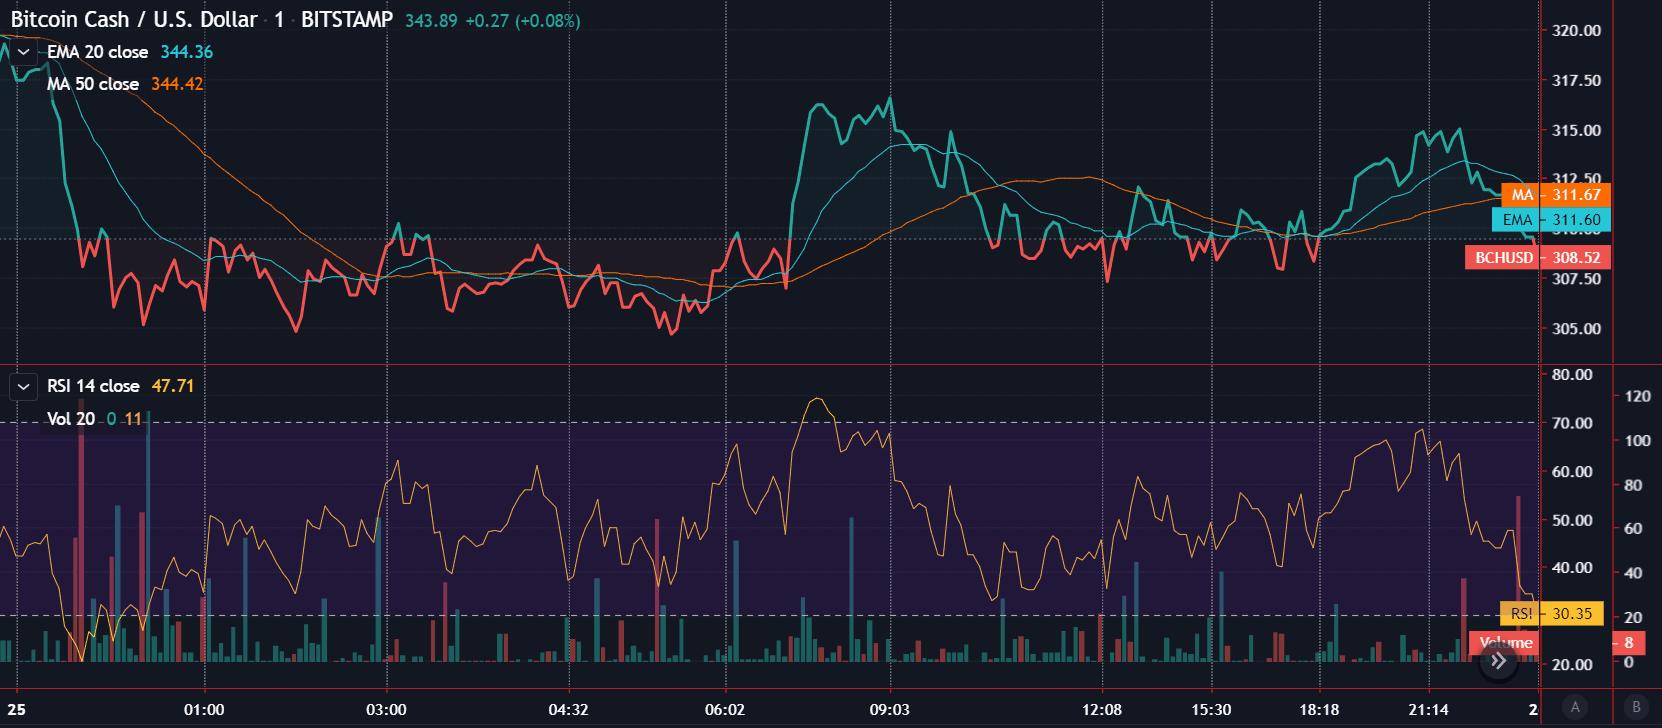 bch trading